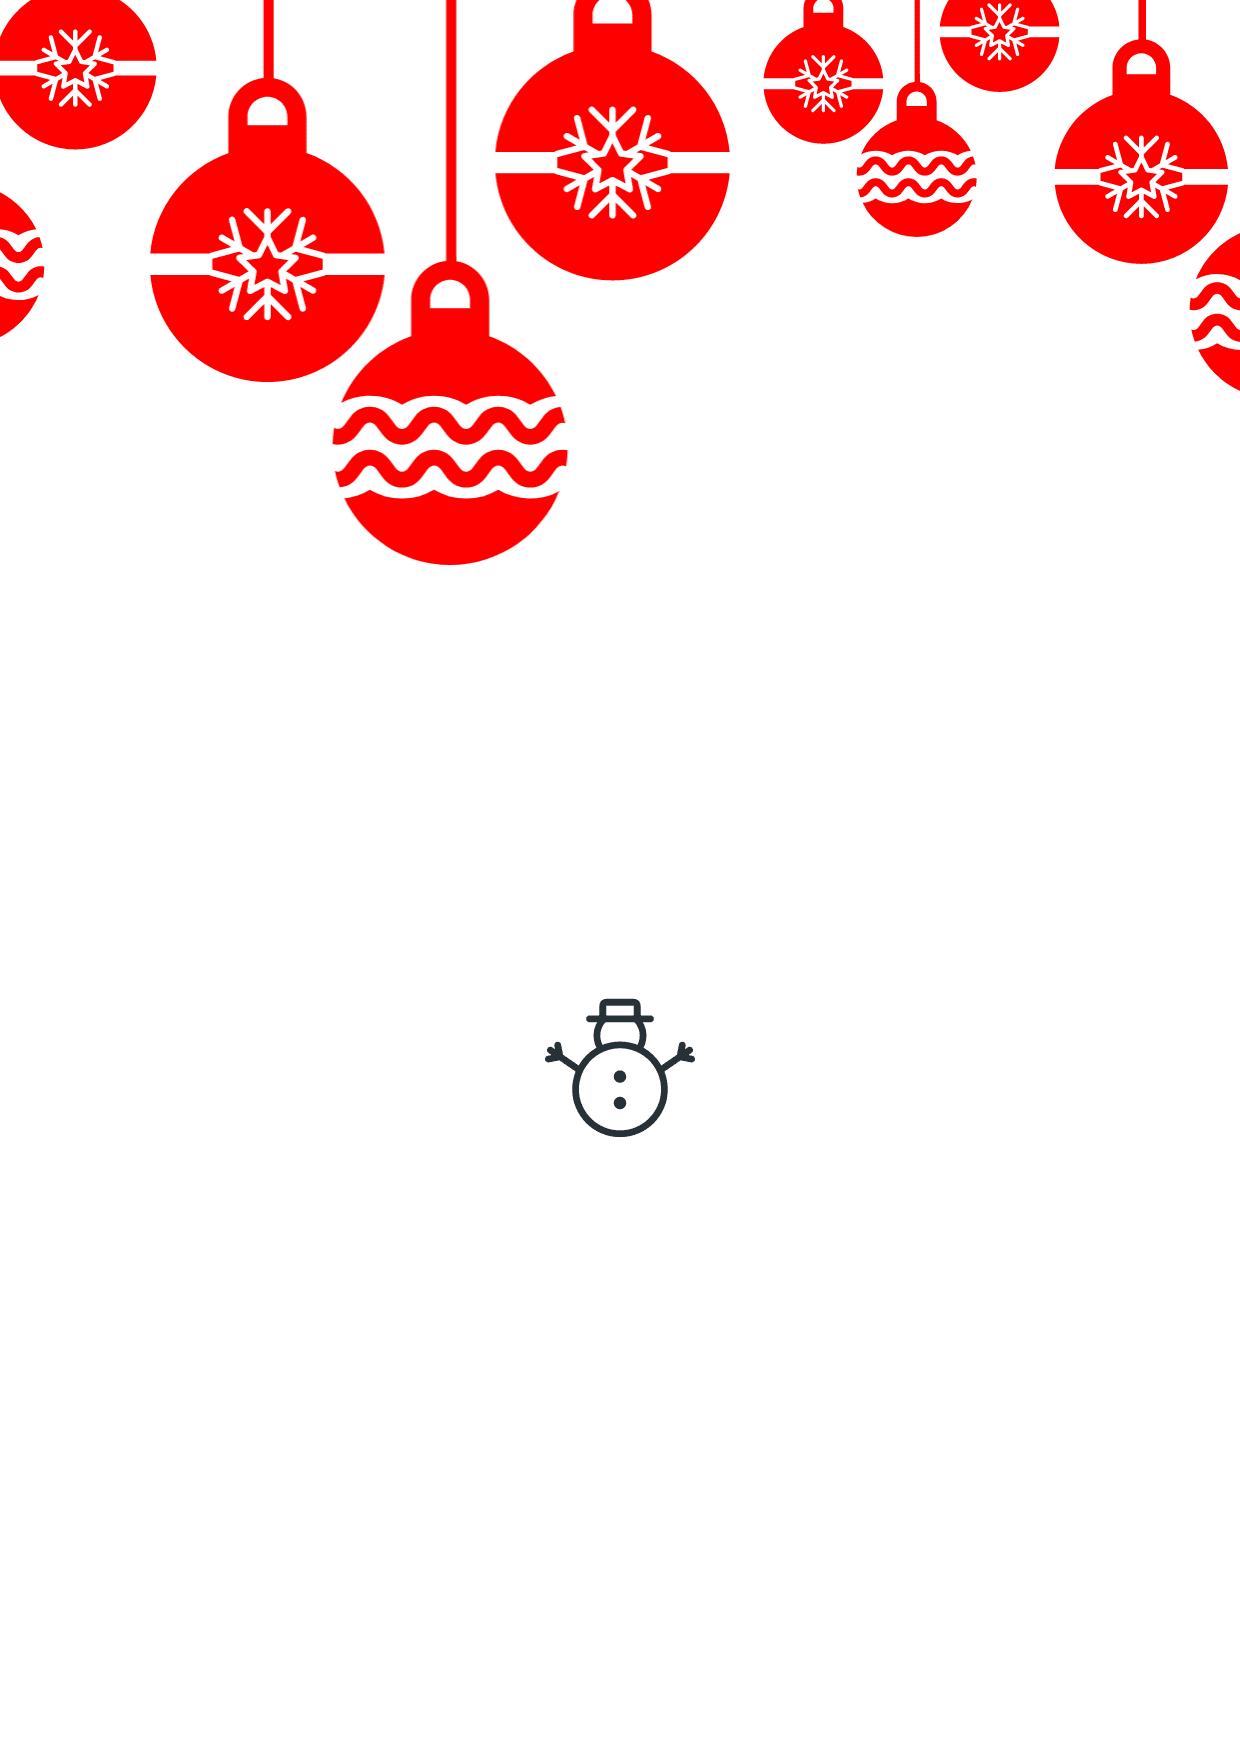 Christmas,                Anniversary,                Holiday,                White,                 Free Image